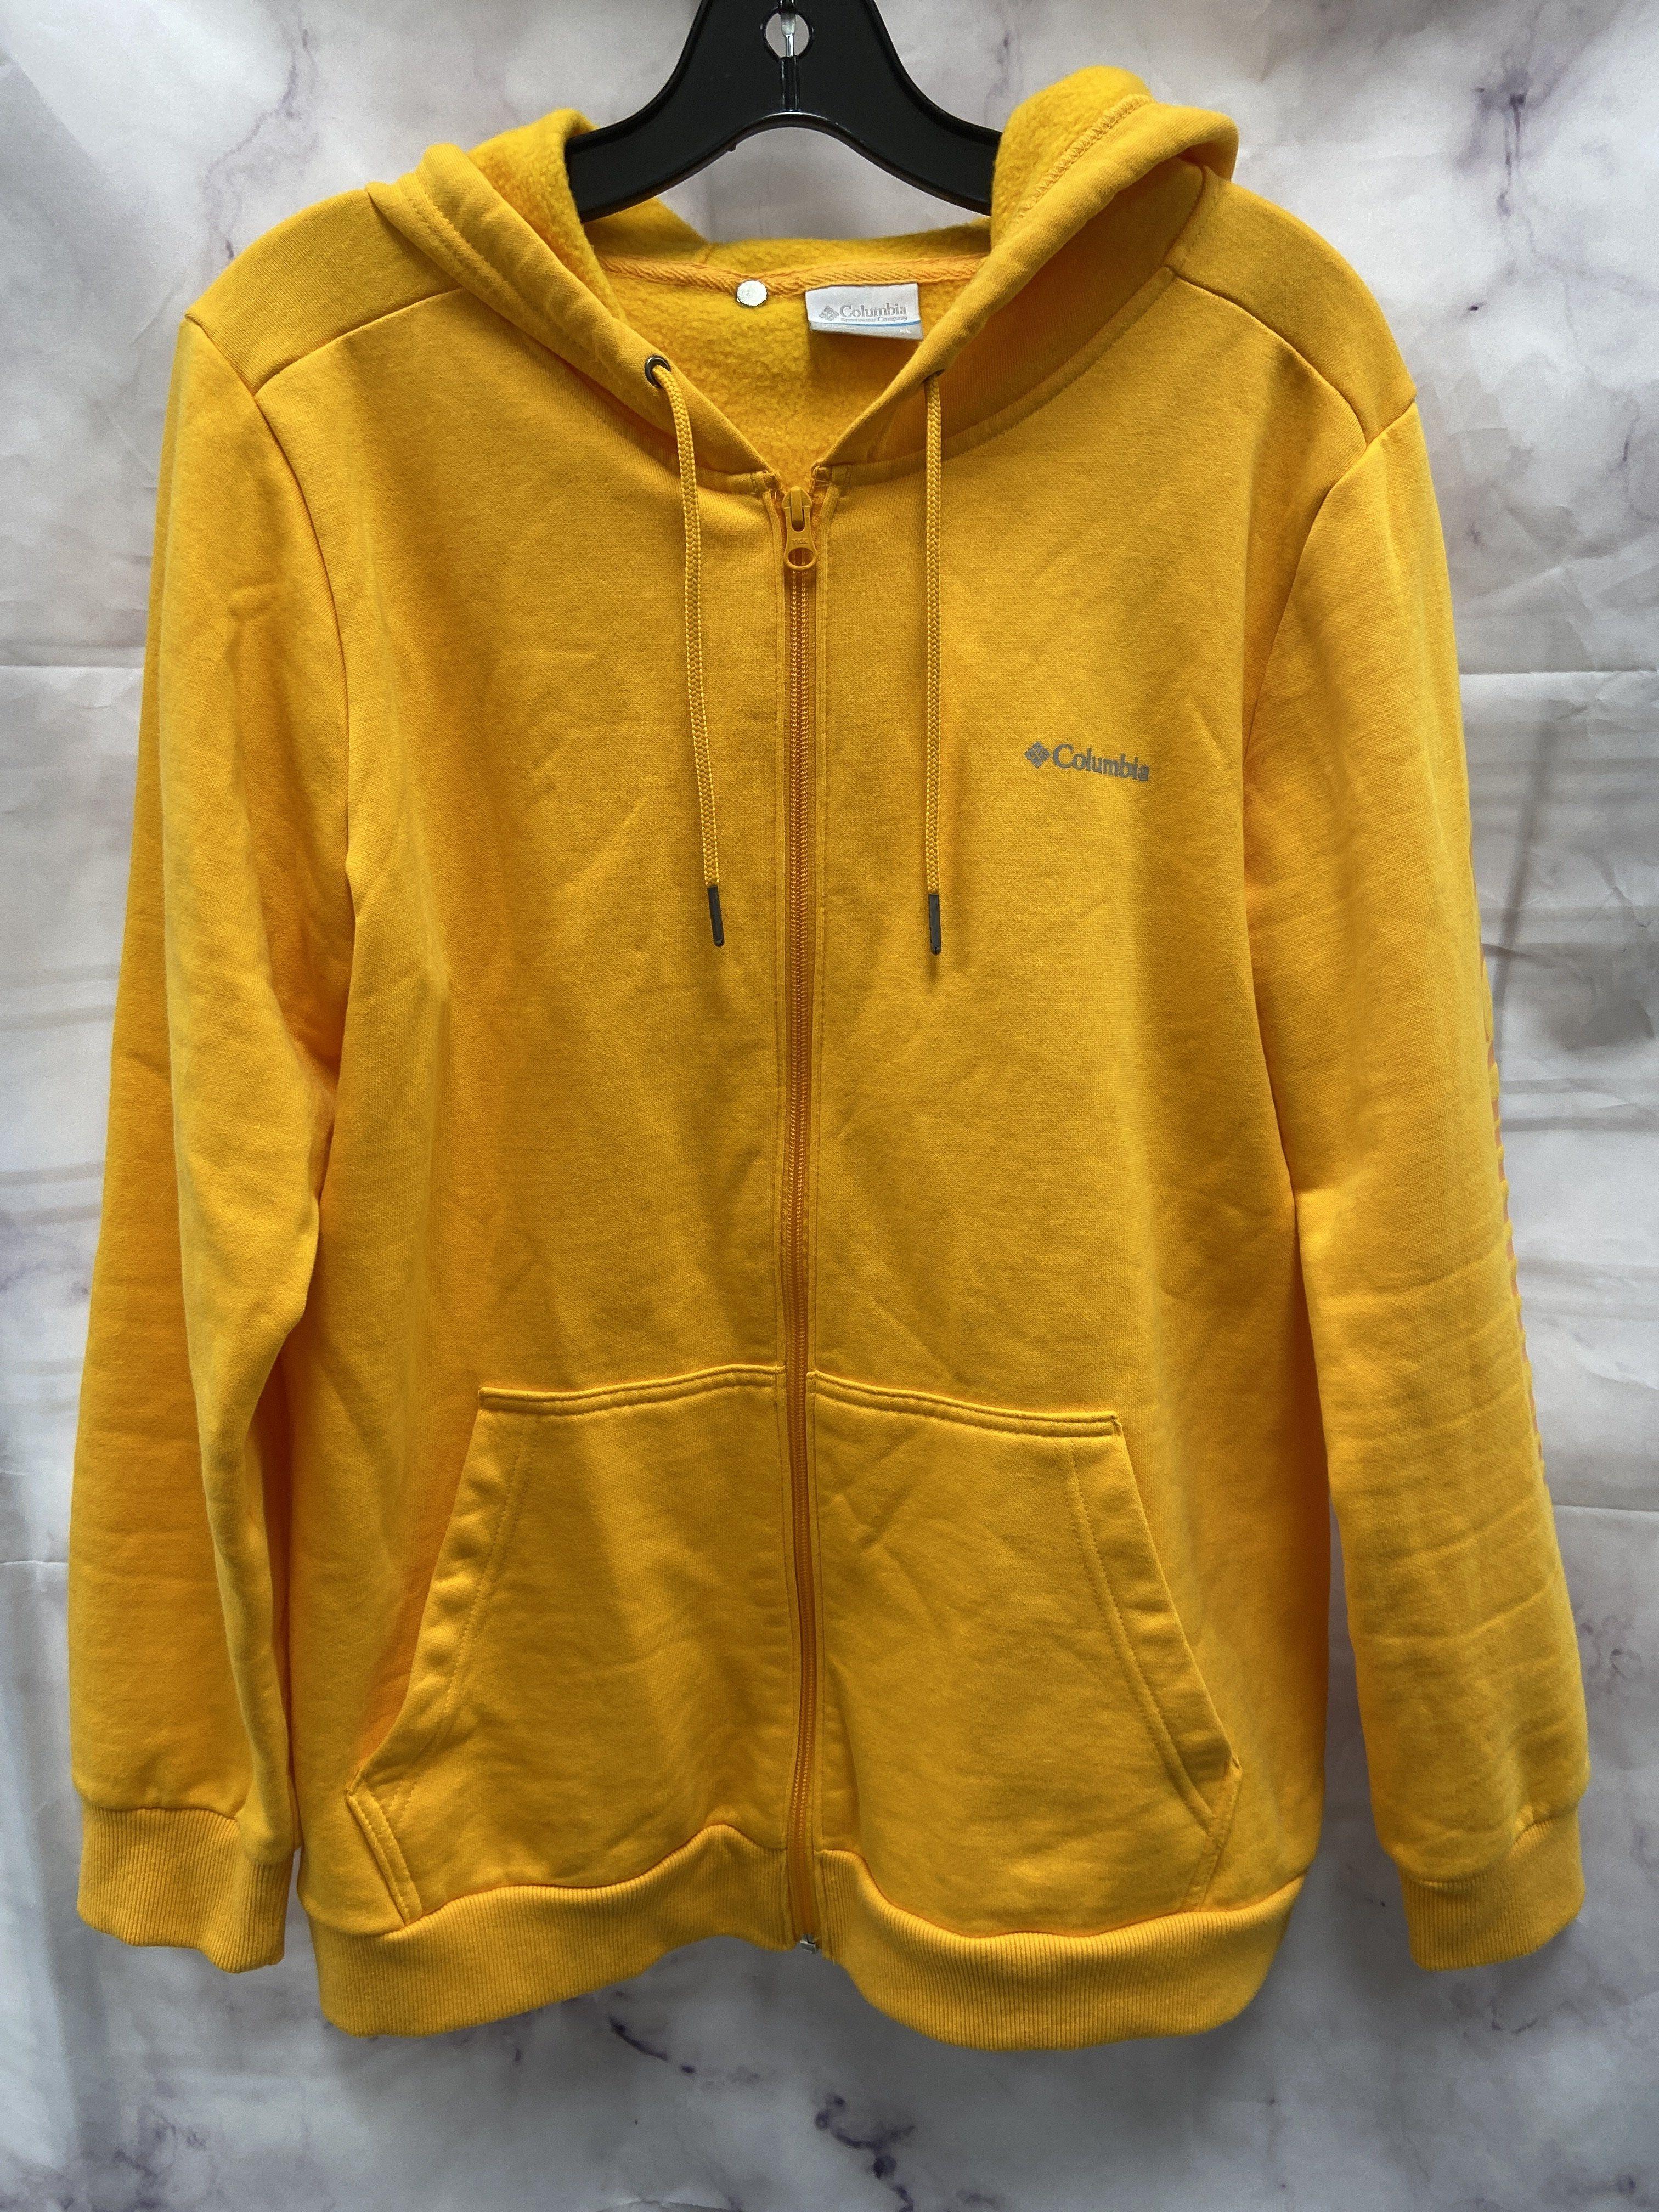 Sweatshirt Hoodie By Columbia  Size: Xl